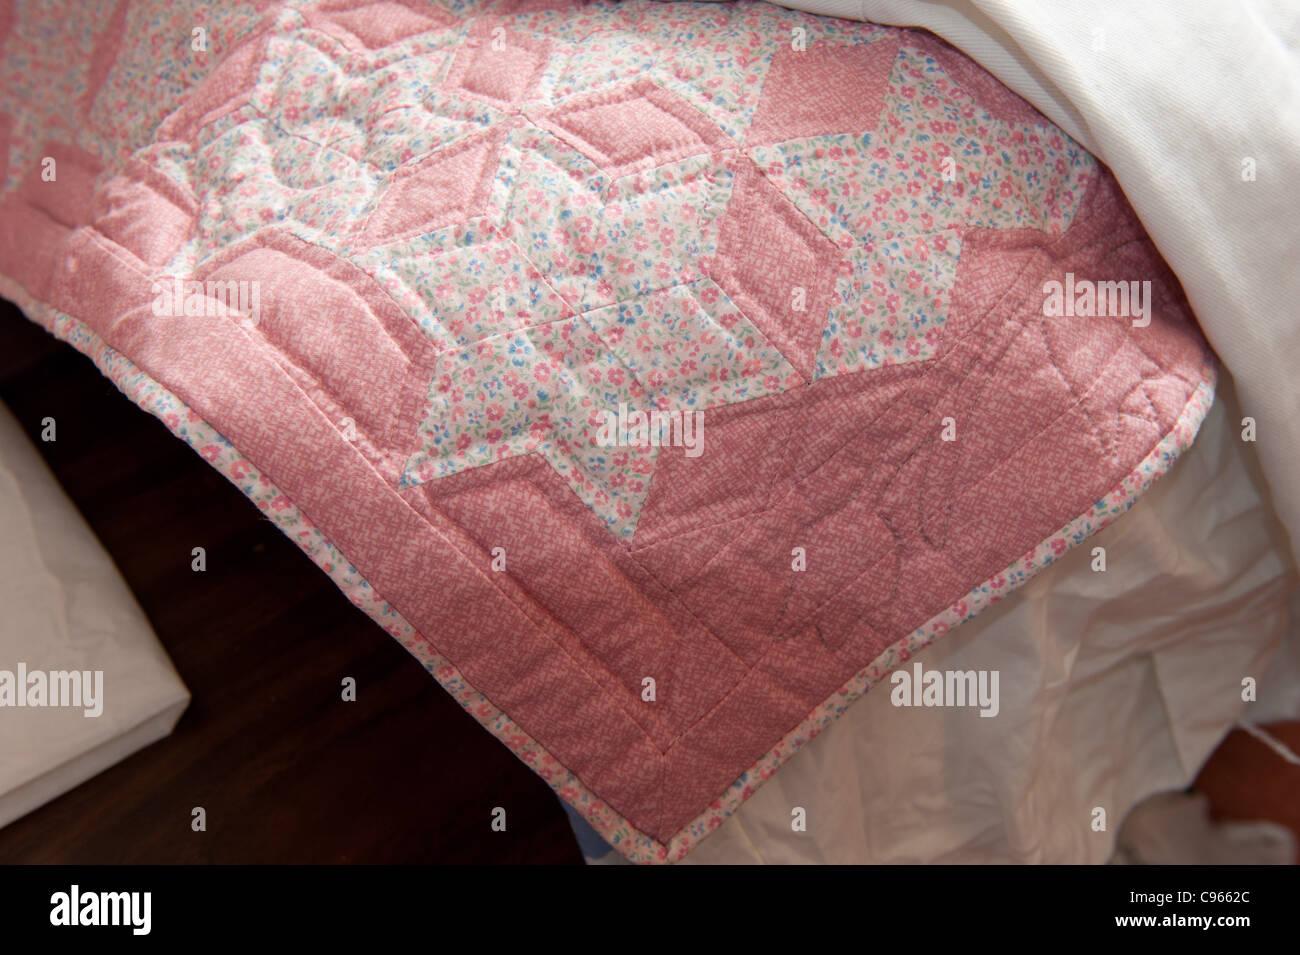 Handmade quilt - Stock Image